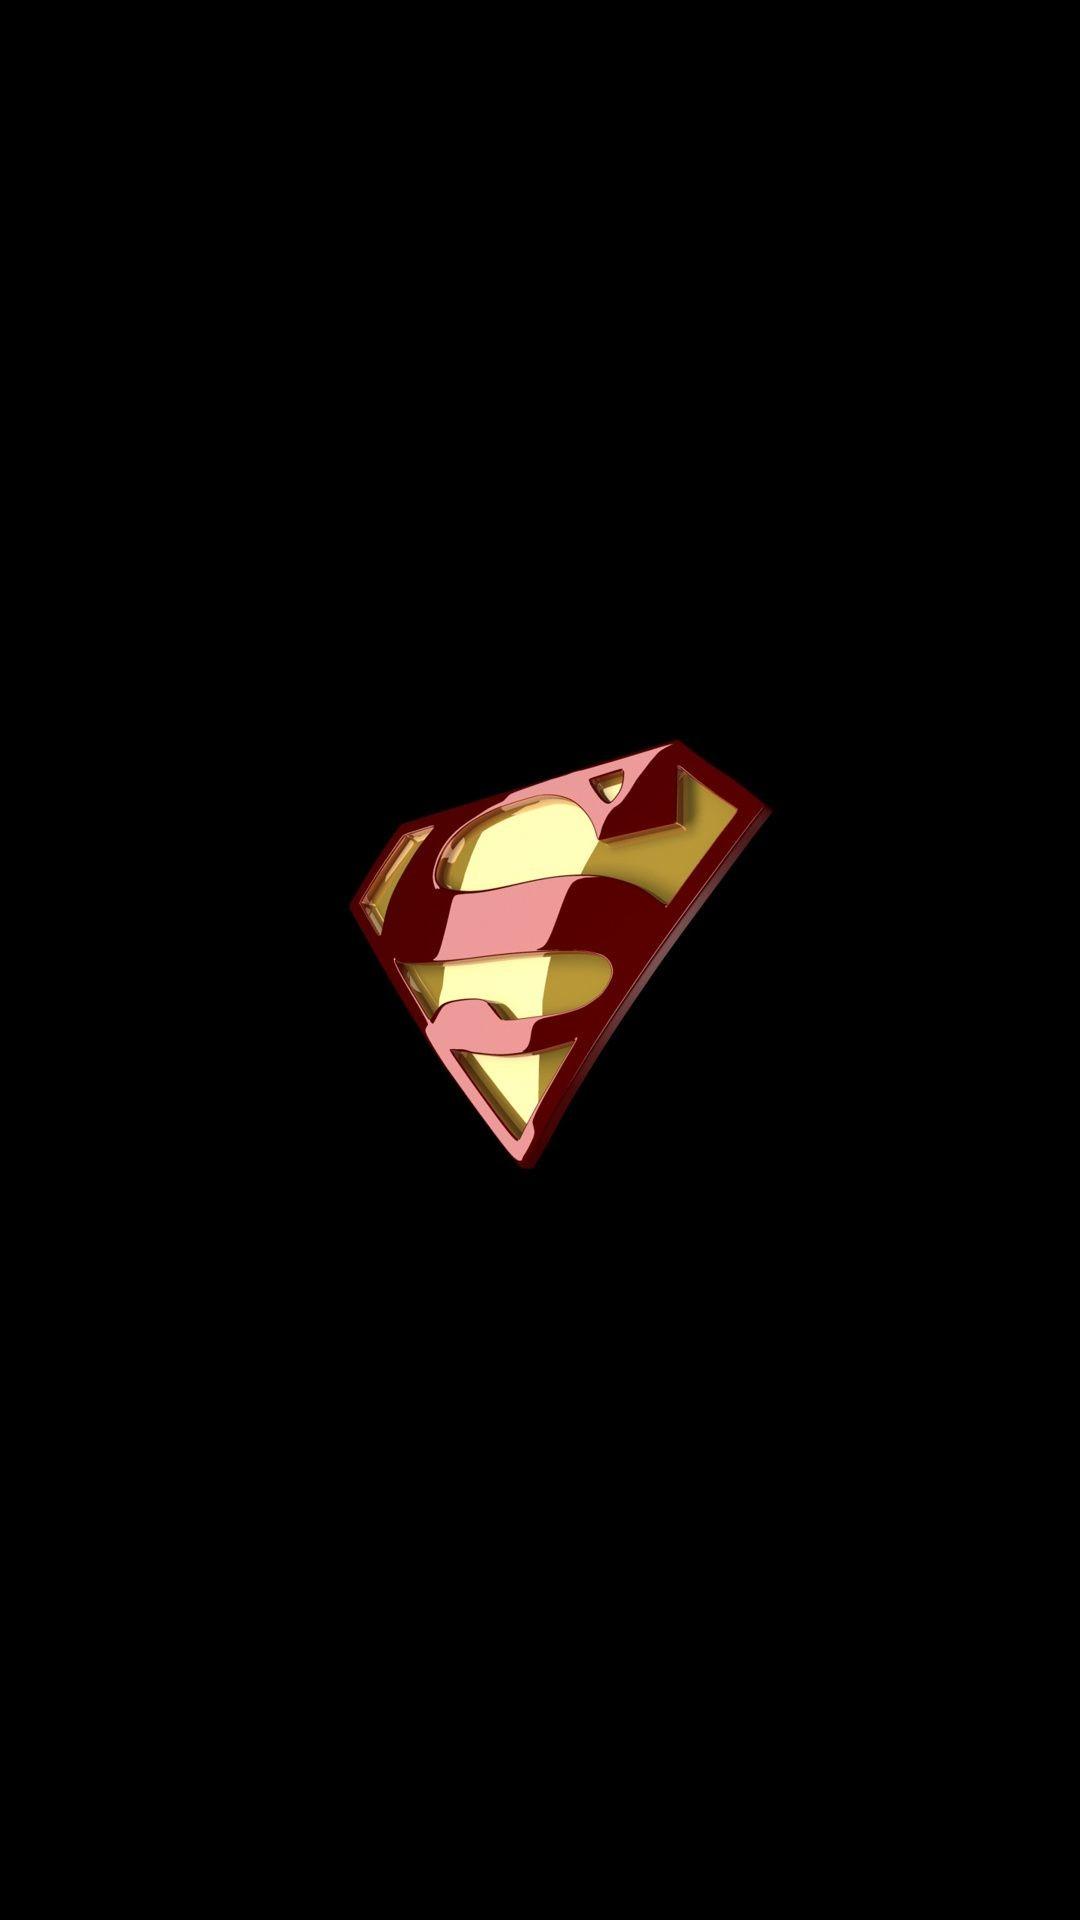 Superman Shield wallpapers - HD